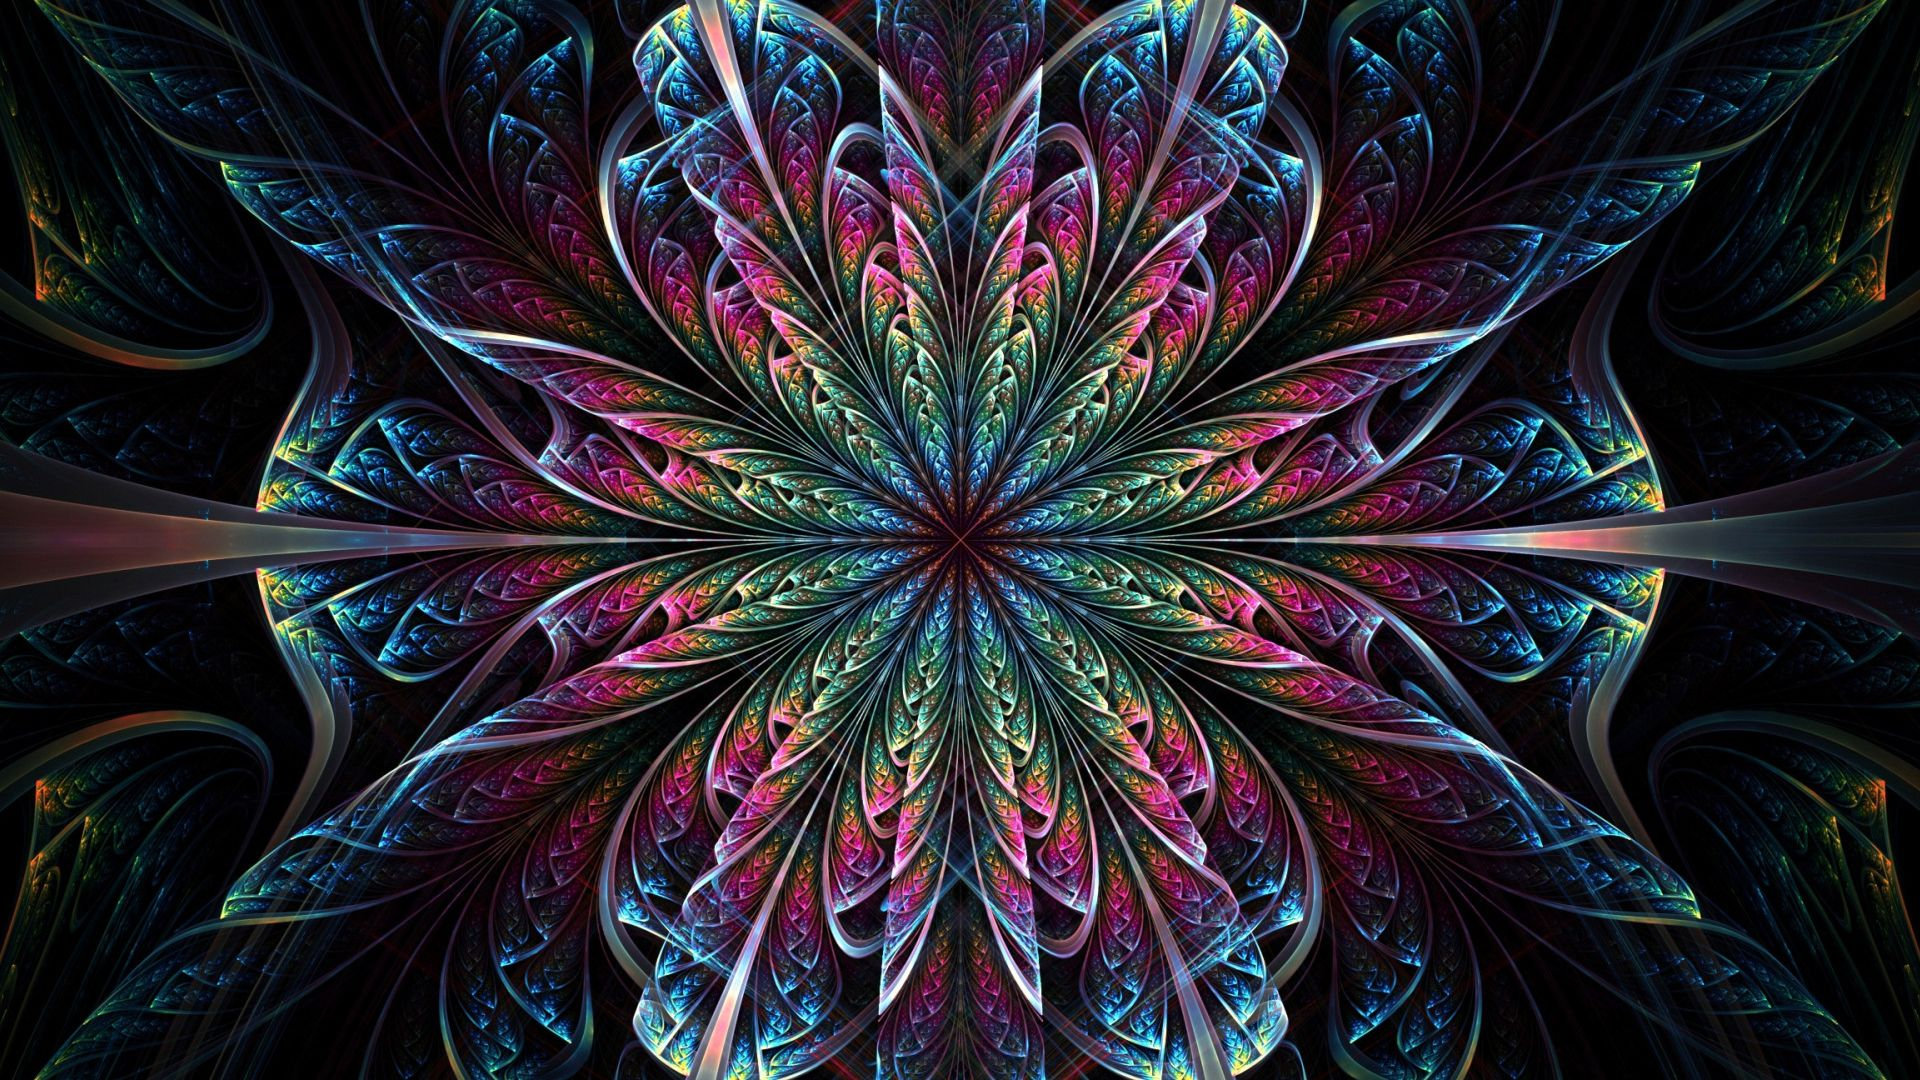 Kaleidoscope Wallpaper and Background